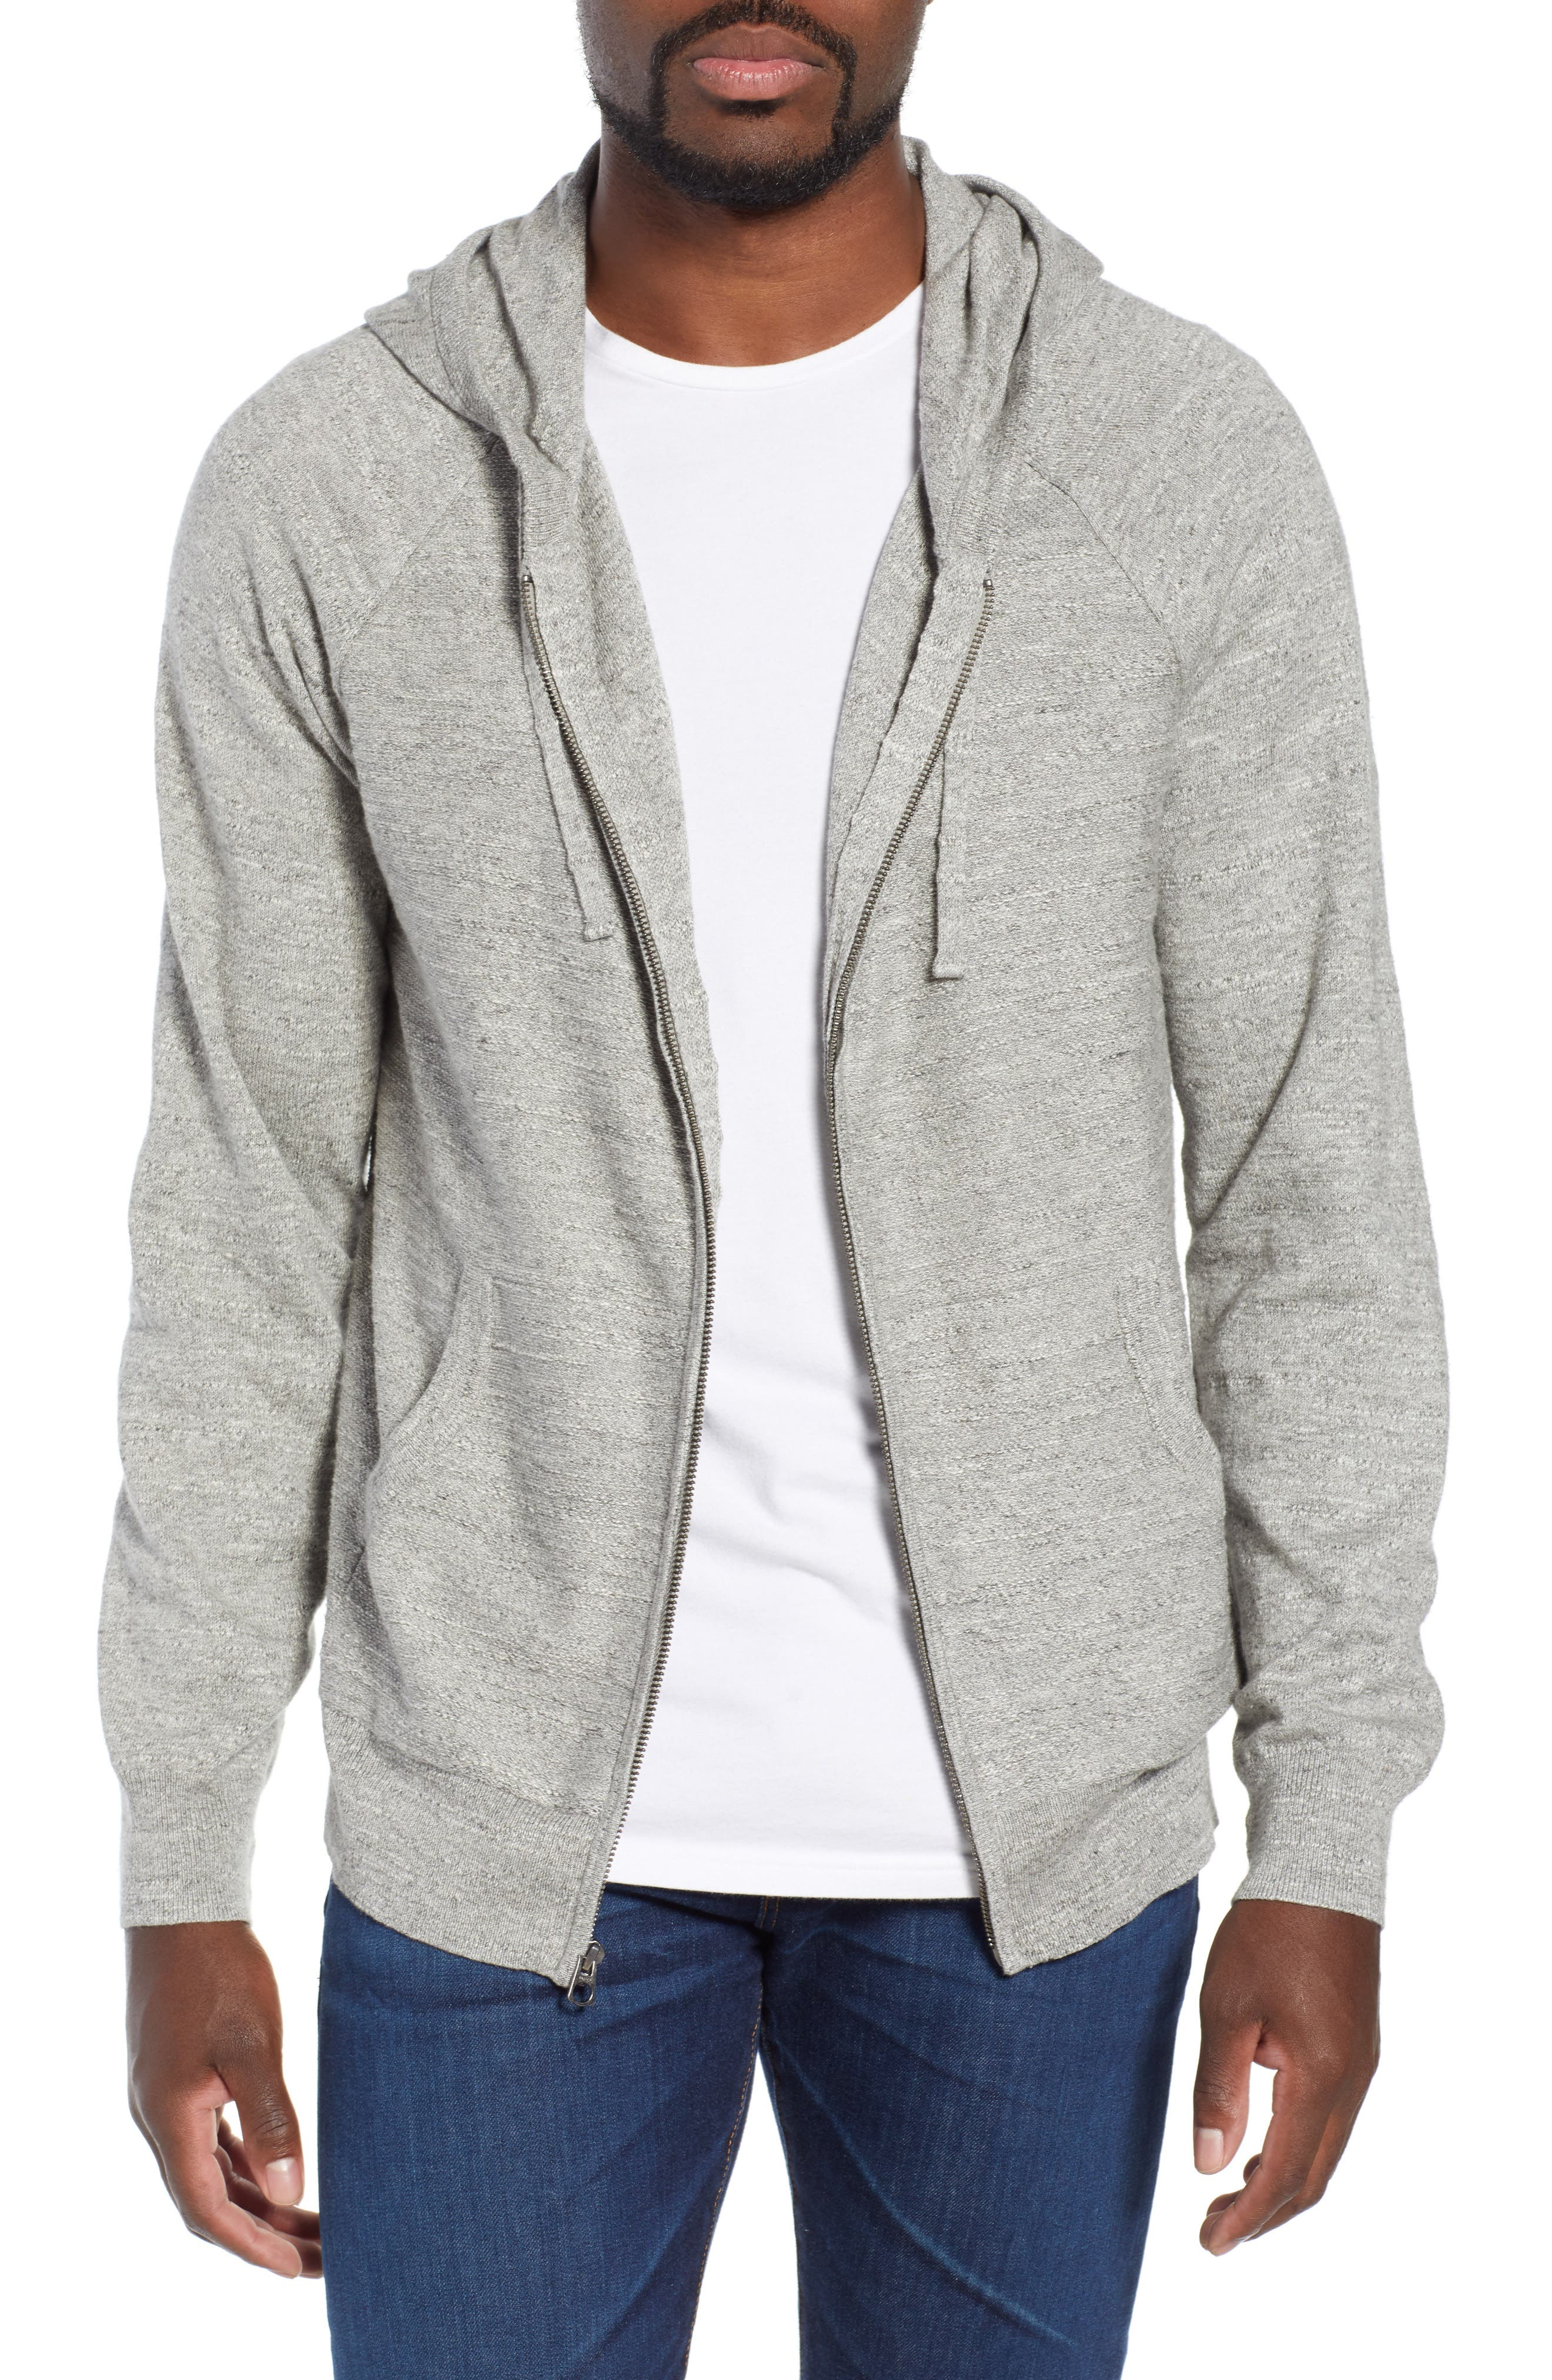 Rugged Raglan Sleeve Cotton Hoodie, Main, color, 020